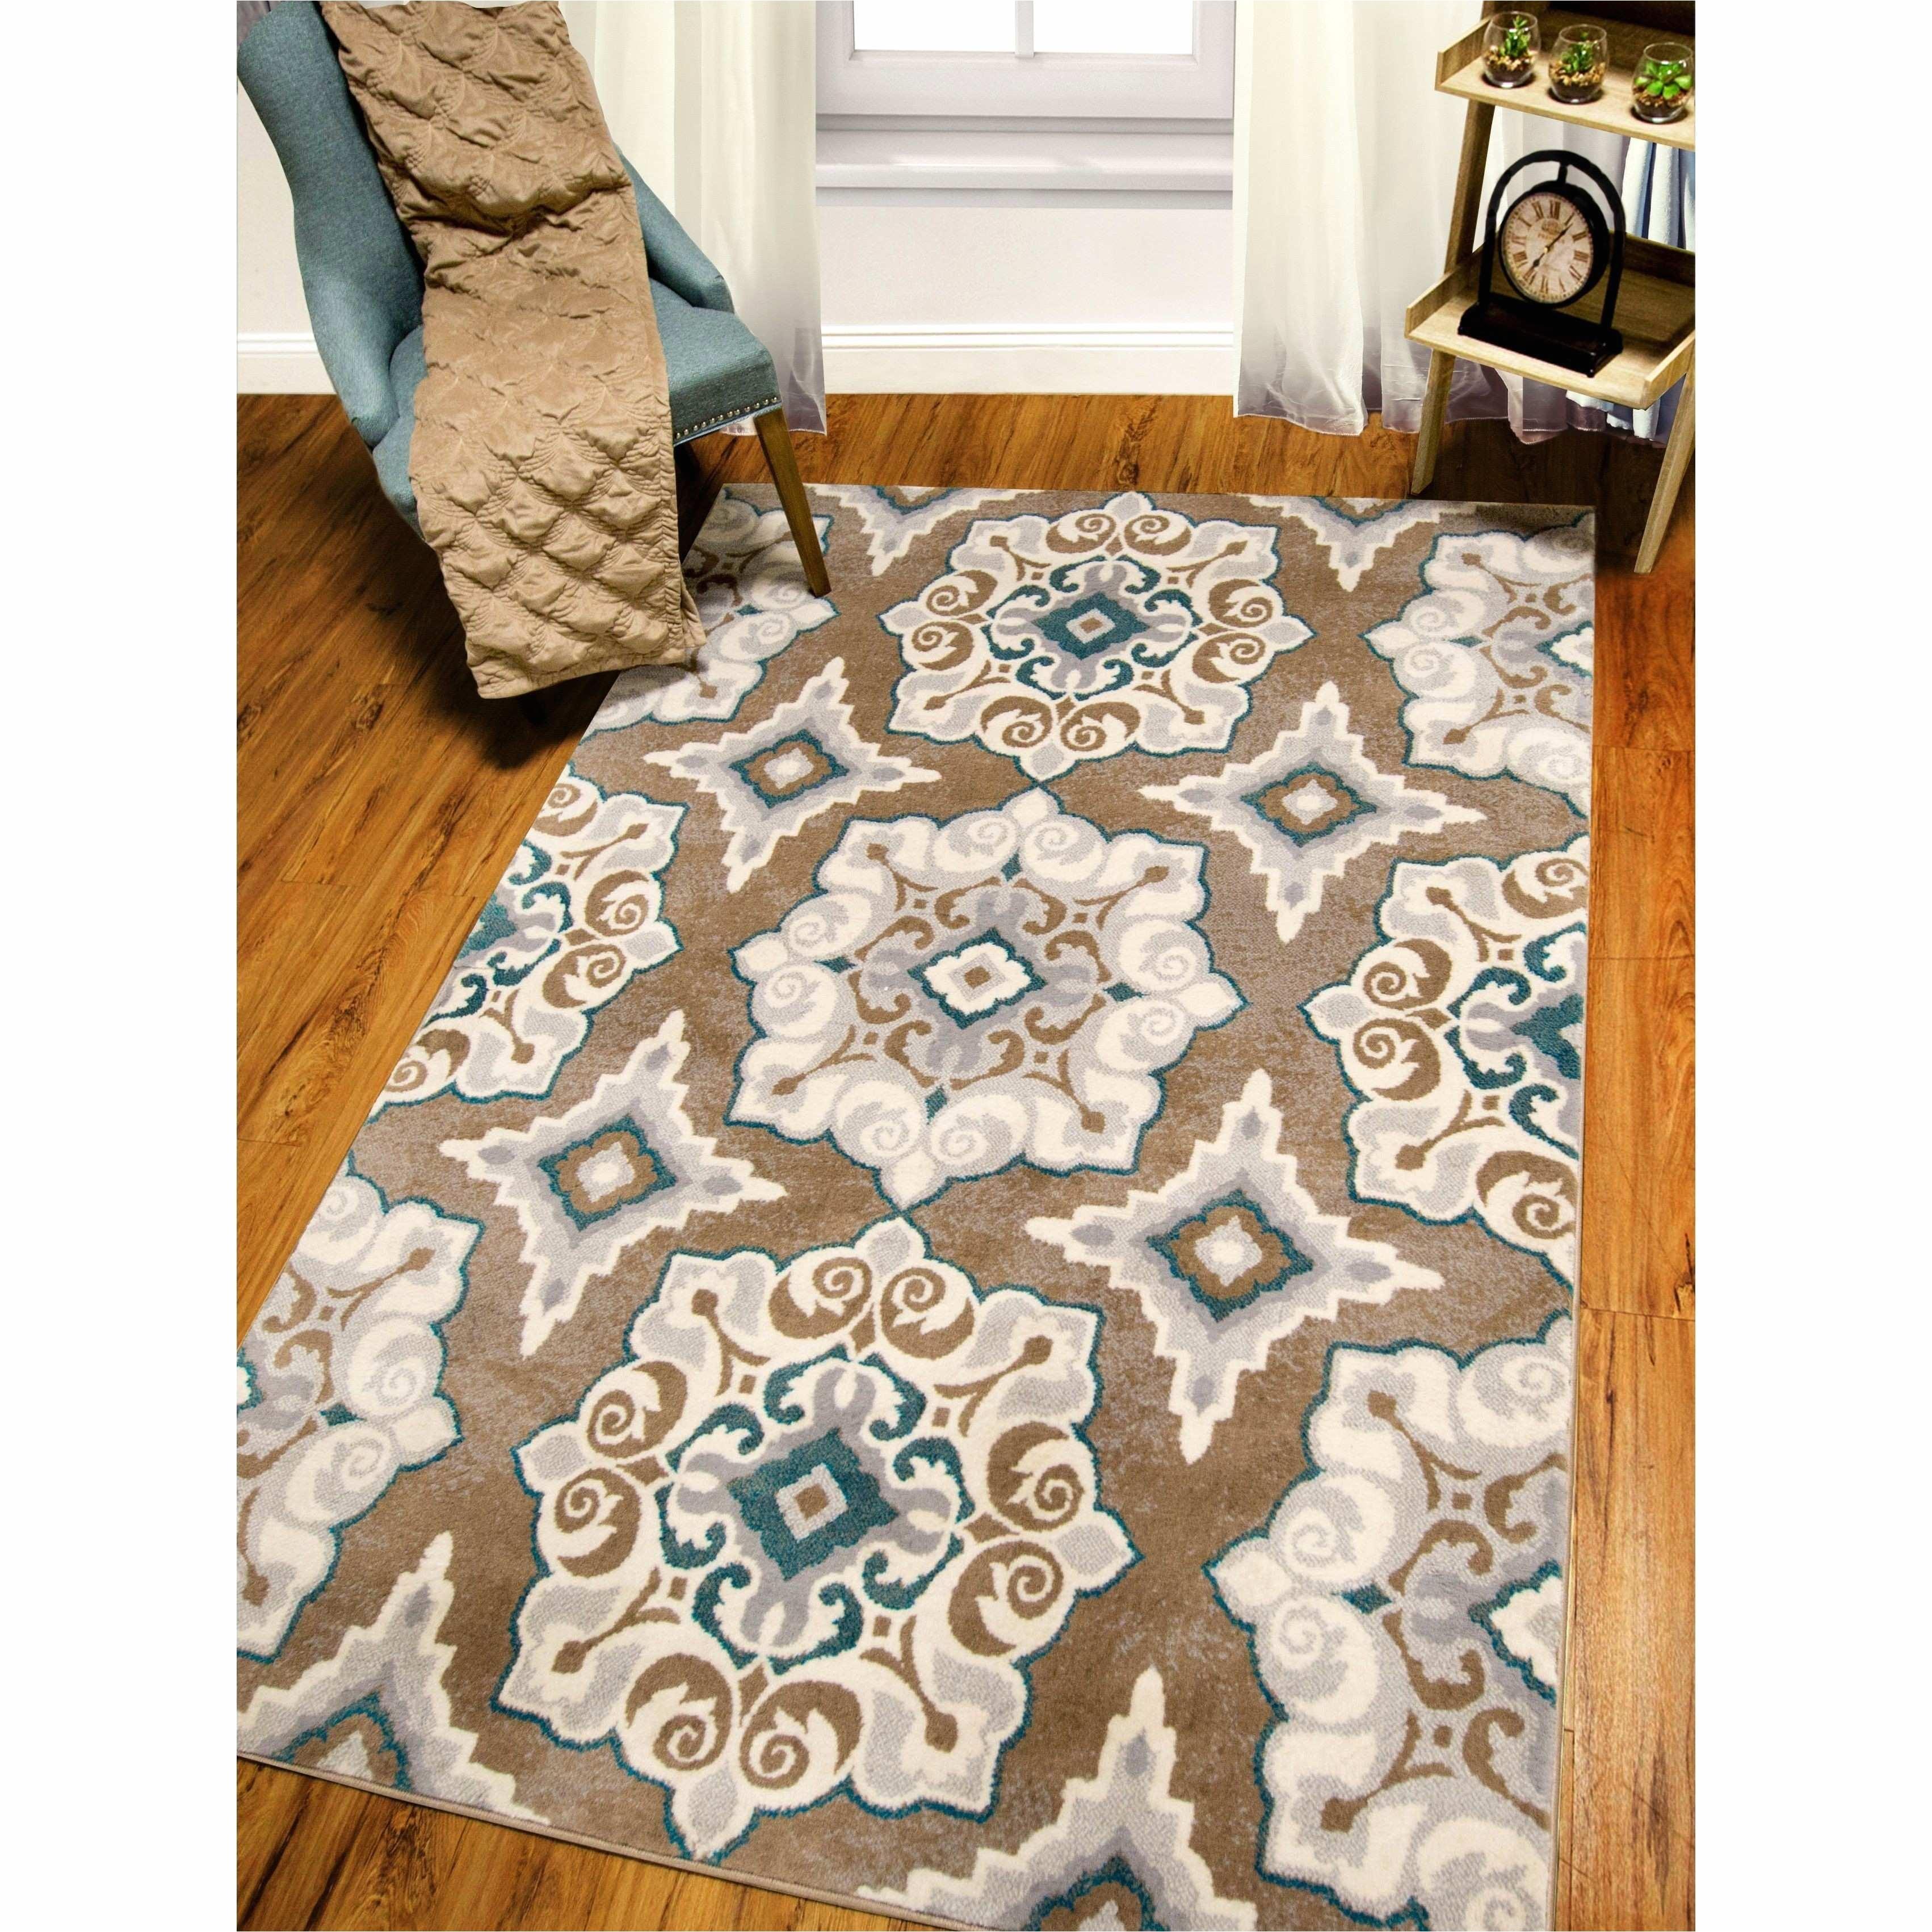 nautical bathroom rugs inspirational best bathroom rug sets all about bathroom inspiration ideas